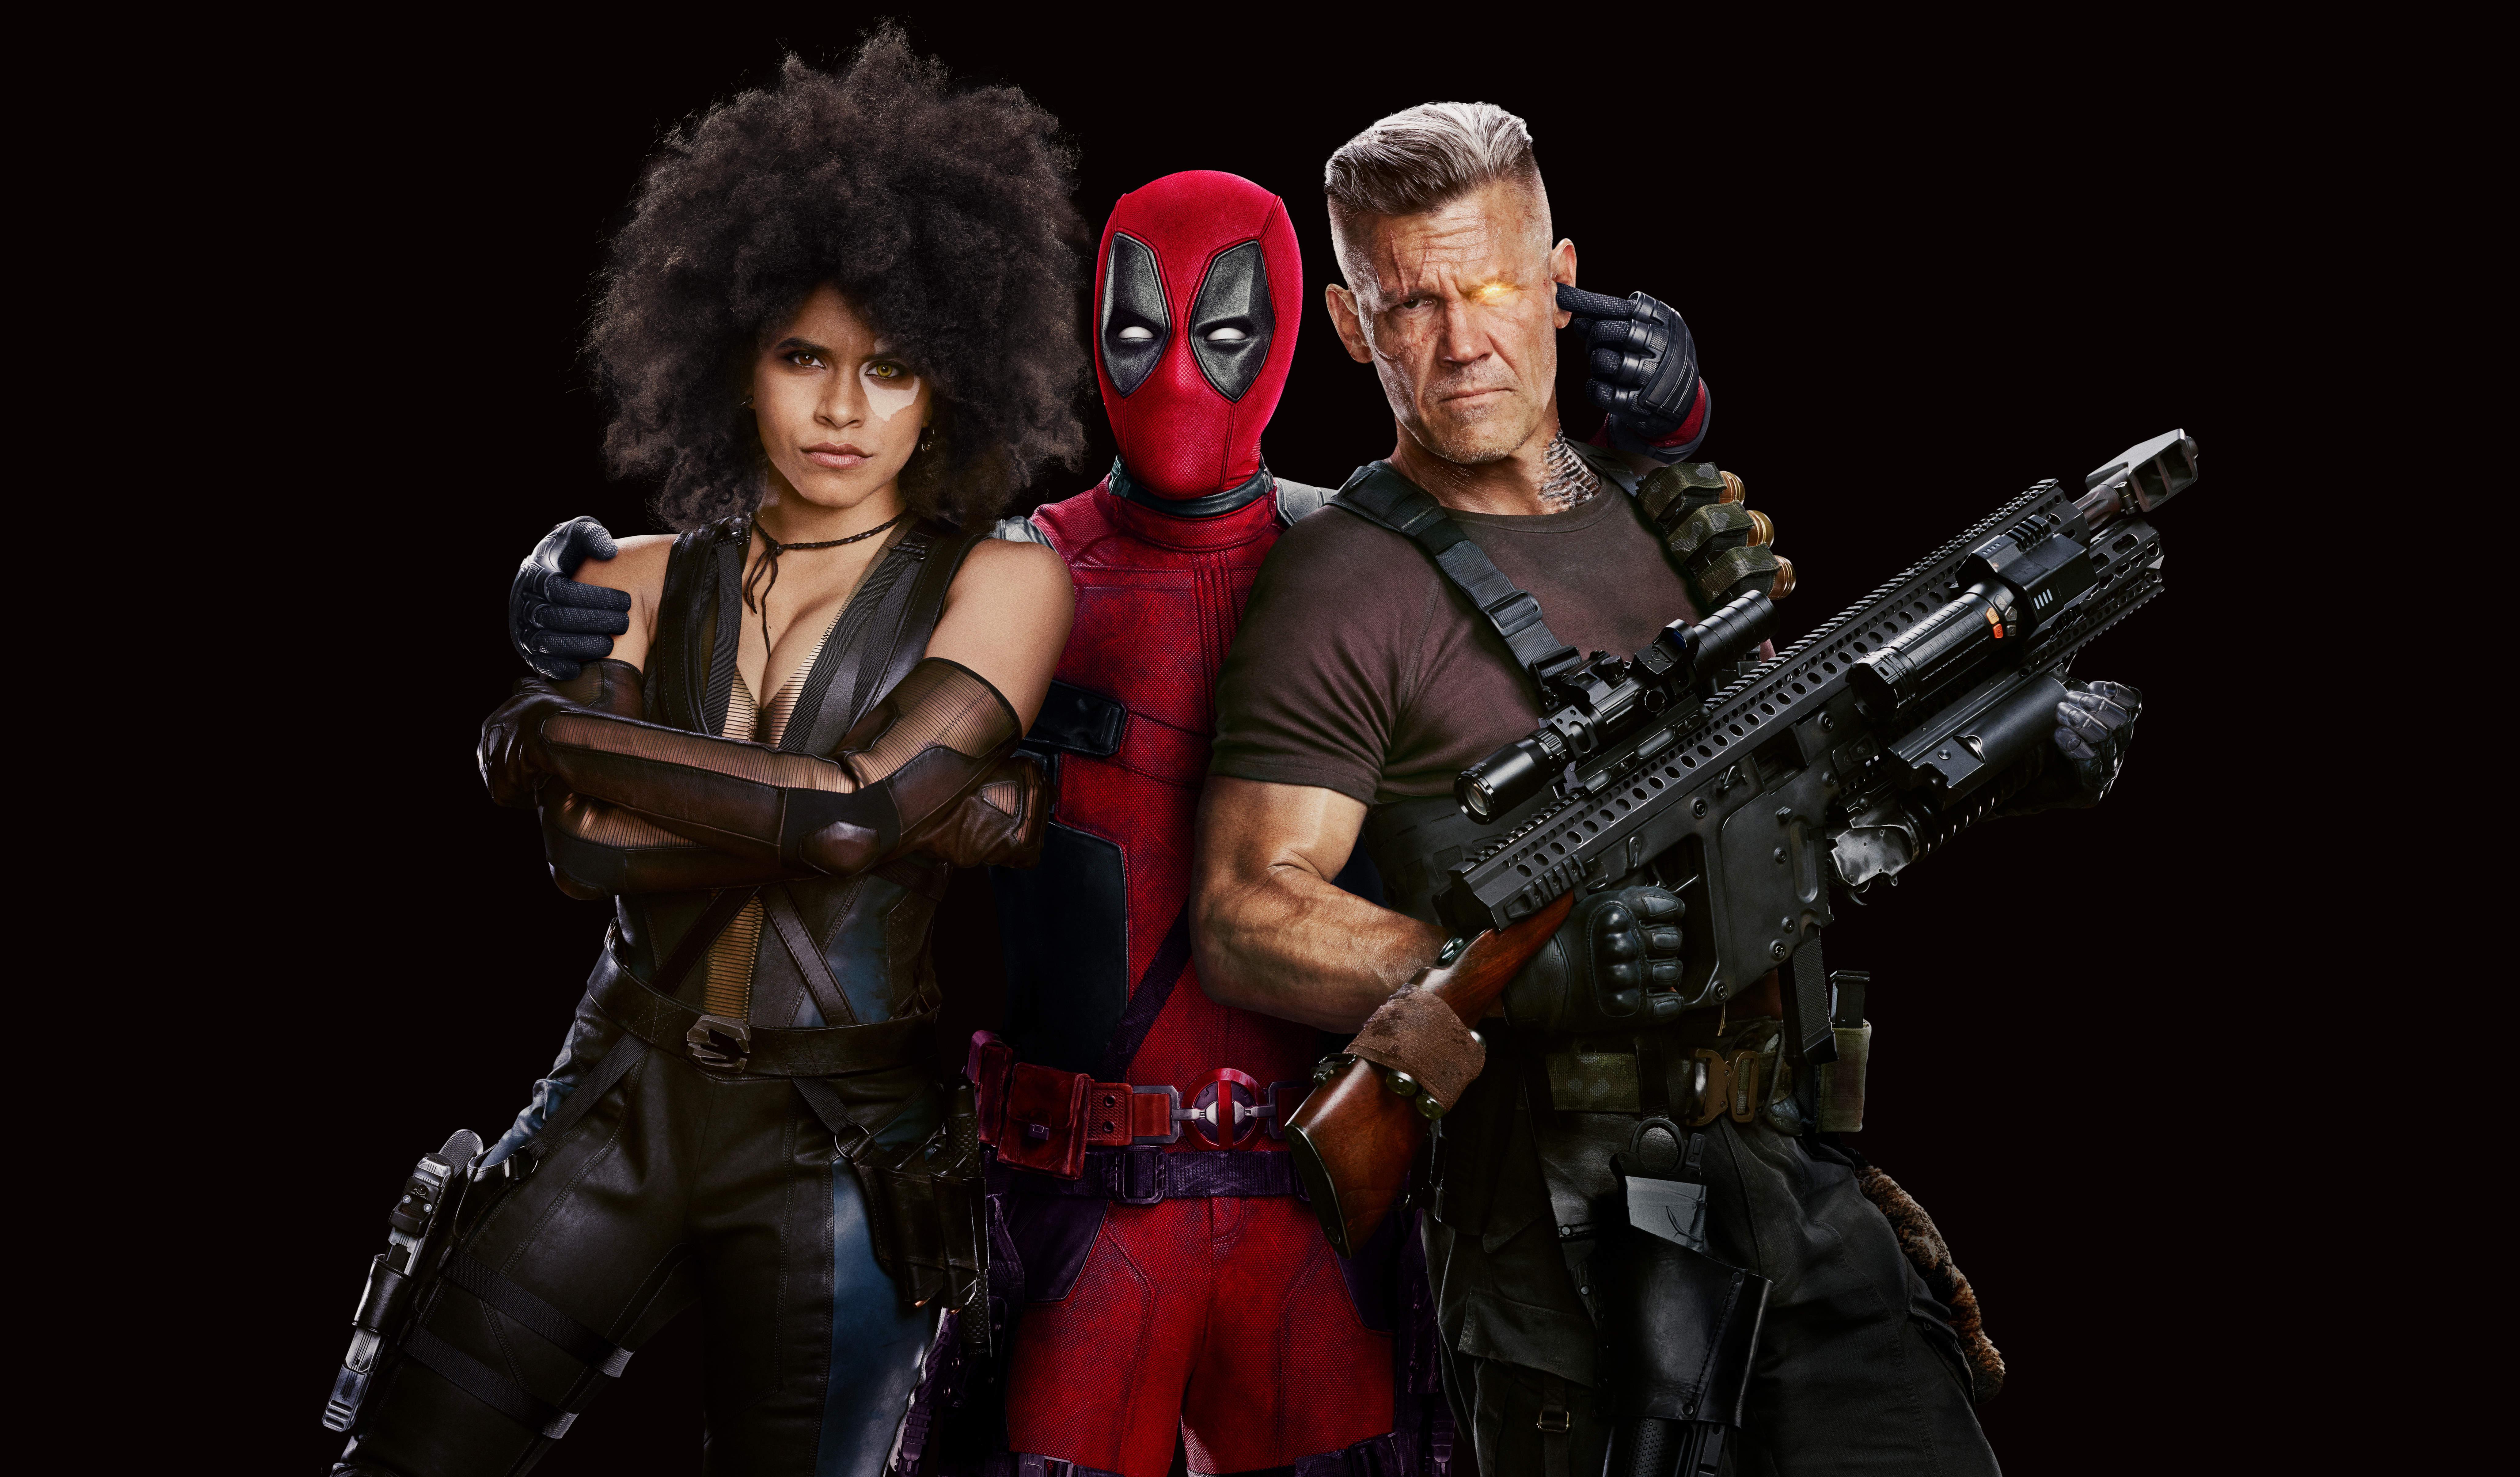 Deadpool 2 Movie Poster Wallpaper, HD